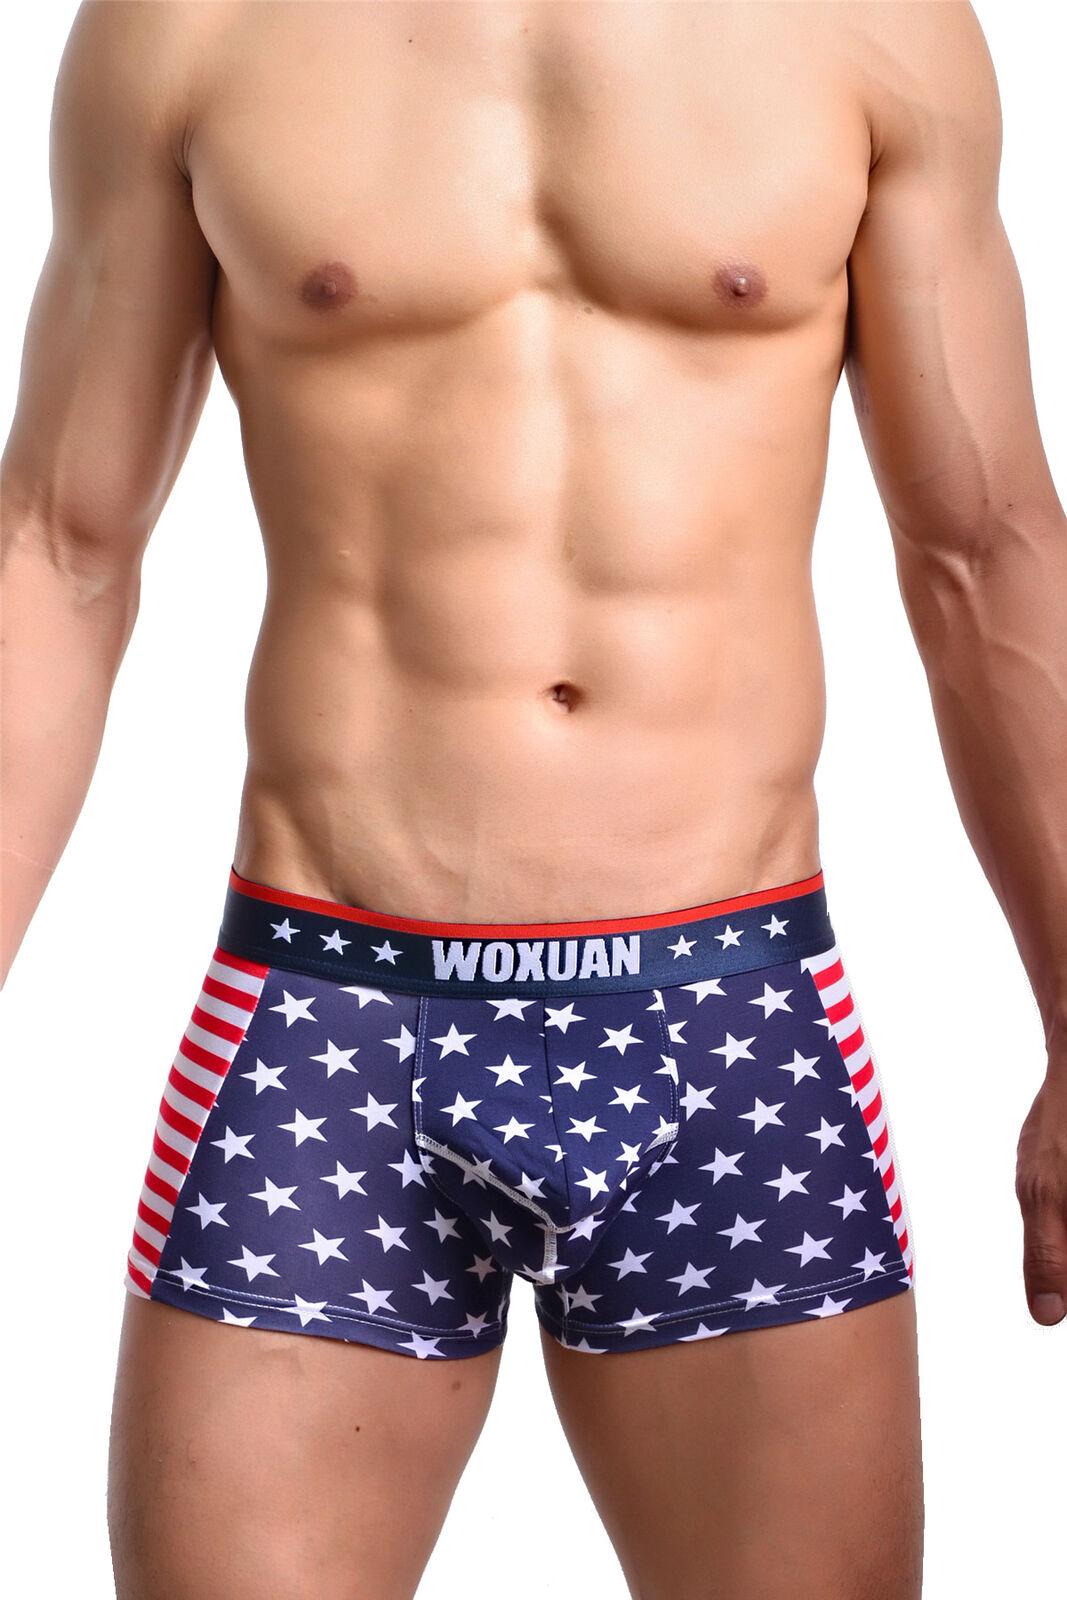 4c0641ac1b34 Mens Vest Leotard Underwear American Flag Printed Sexy Boxer Briefs Shorts  Pants